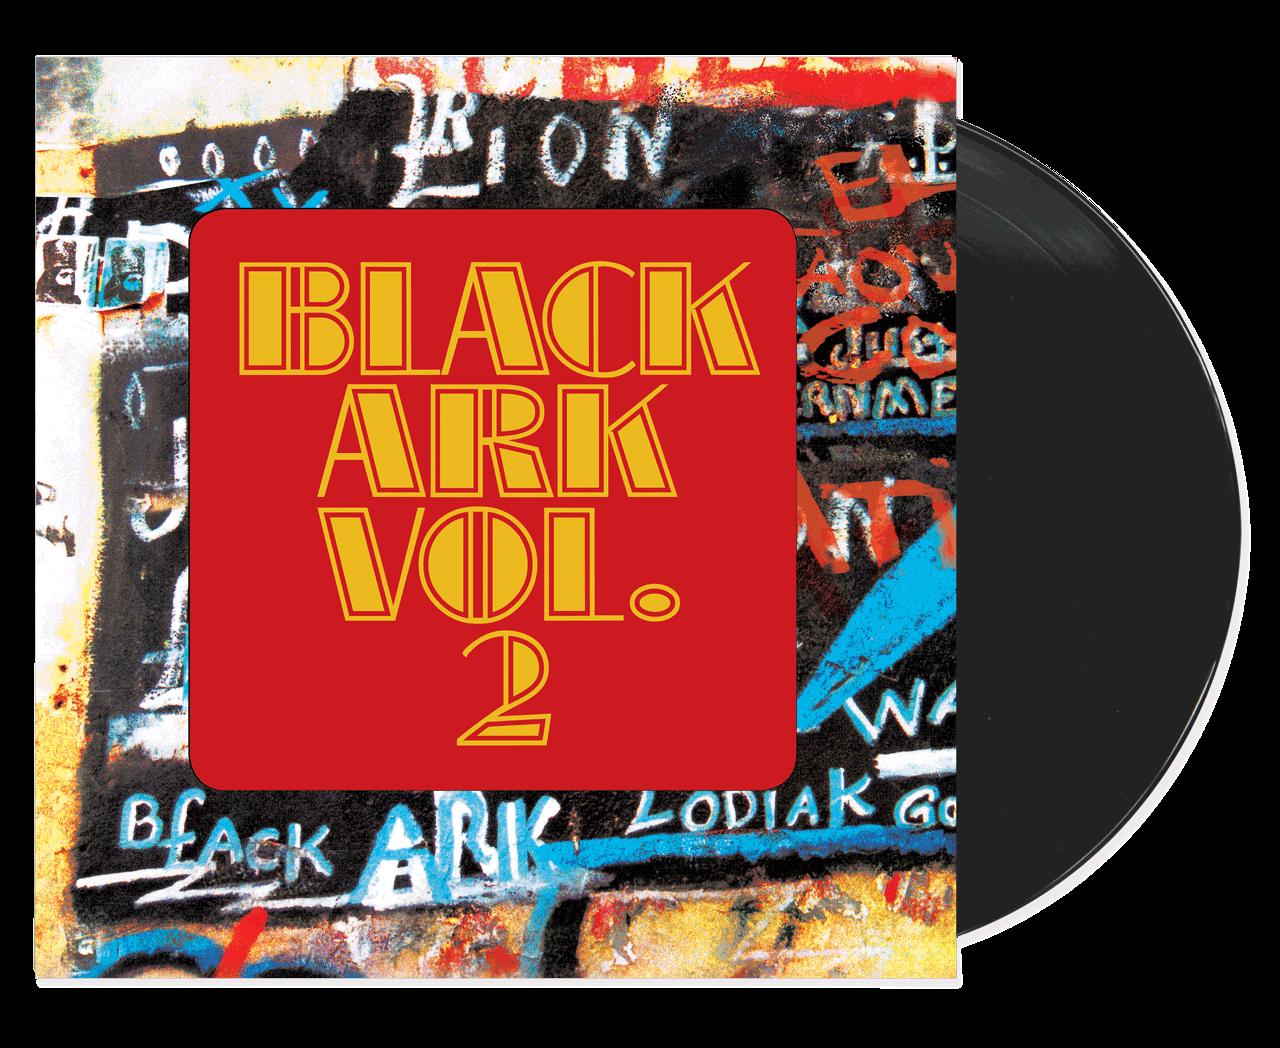 Black Ark Vol. 2 (LP Vinyl)